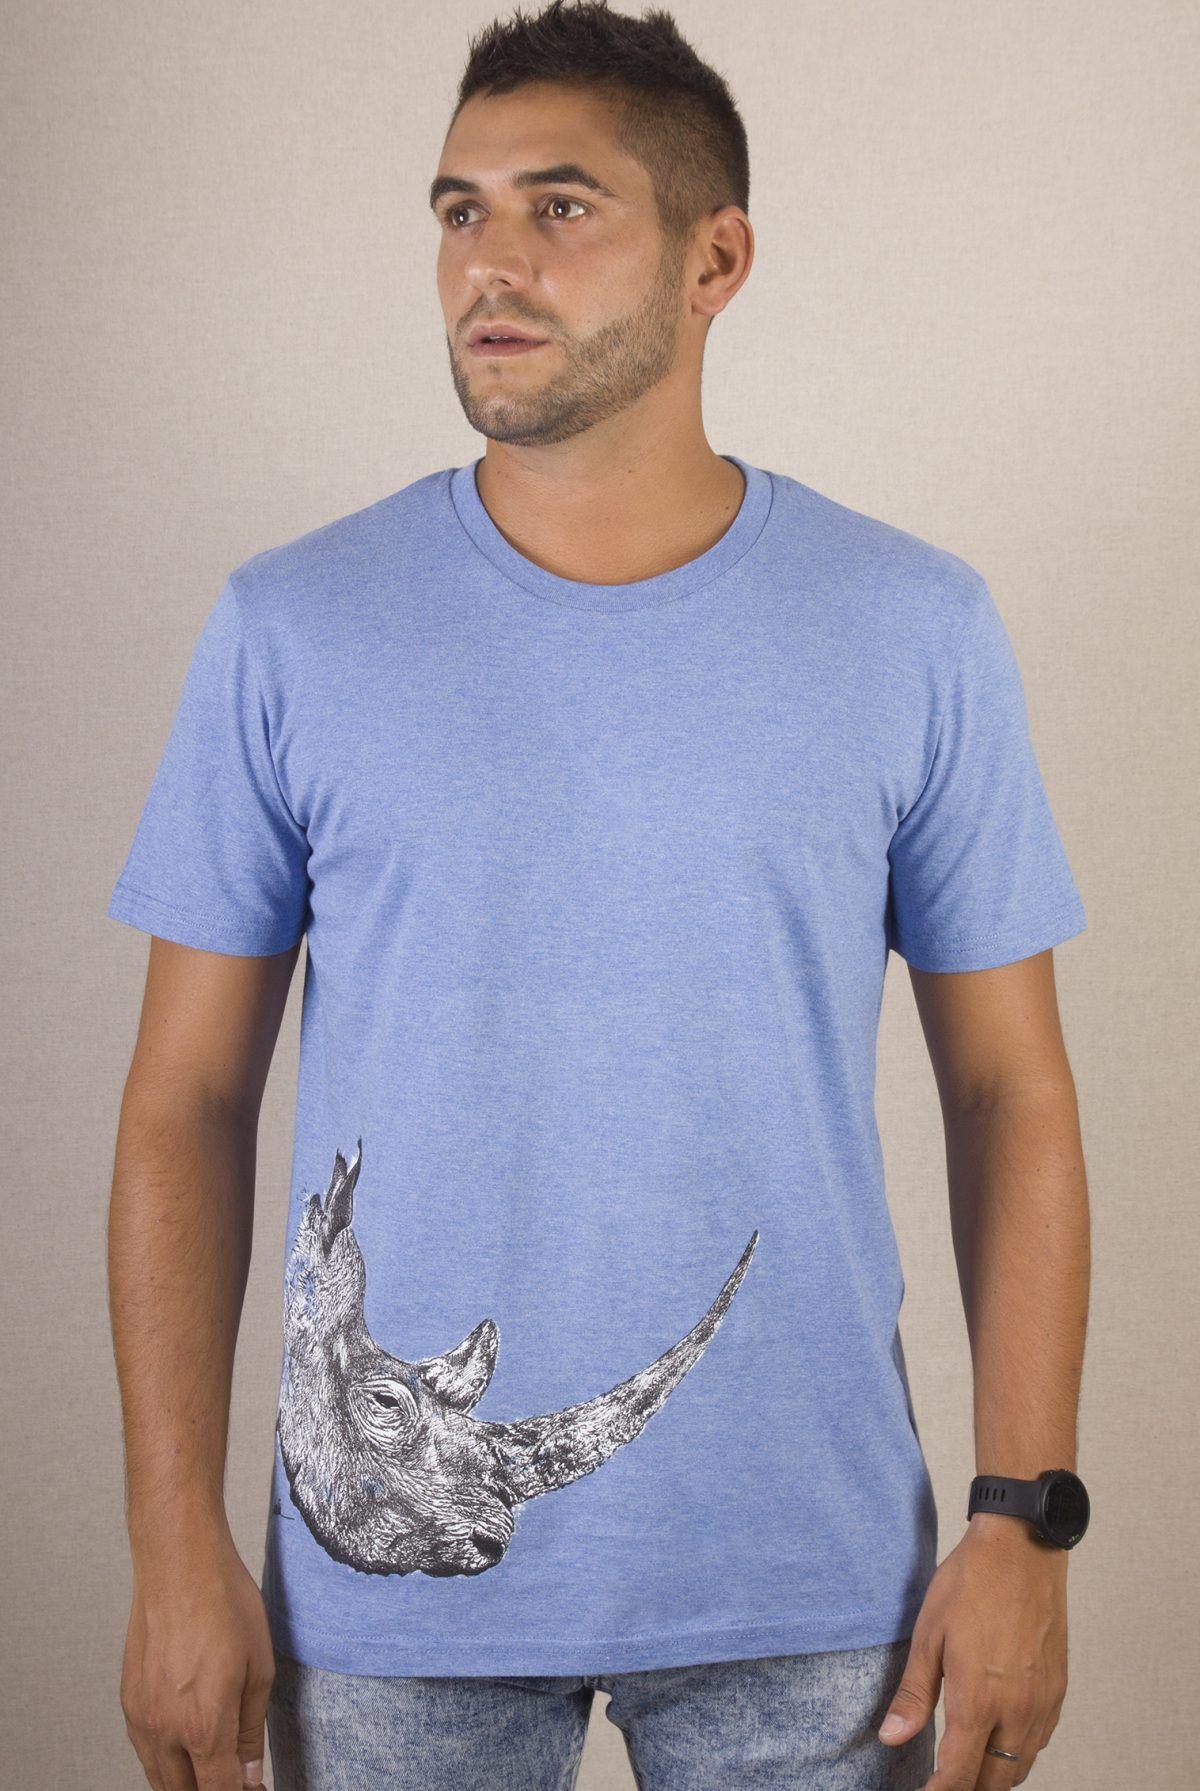 Camiseta hombre Rinoceronte-sirem wild